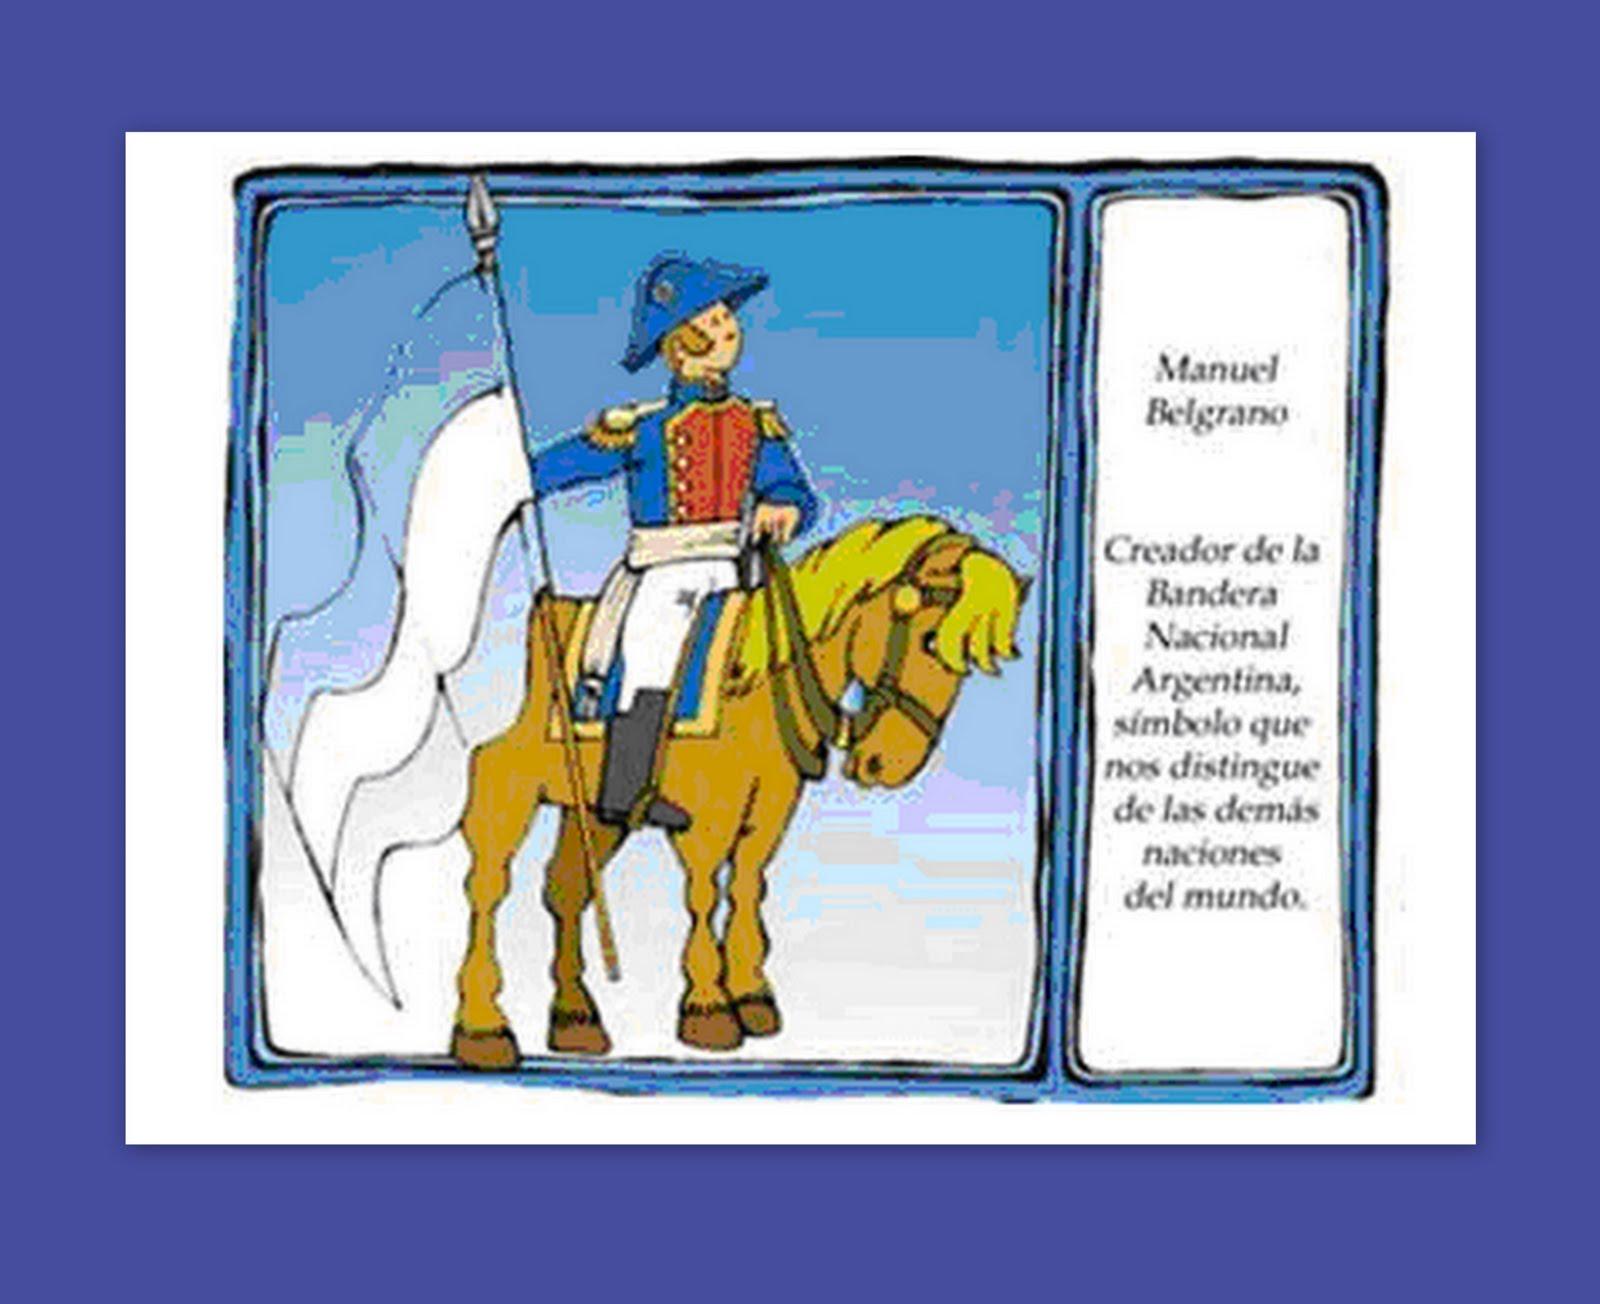 Tarjeta Invitacion Acto Dia De La Bandera